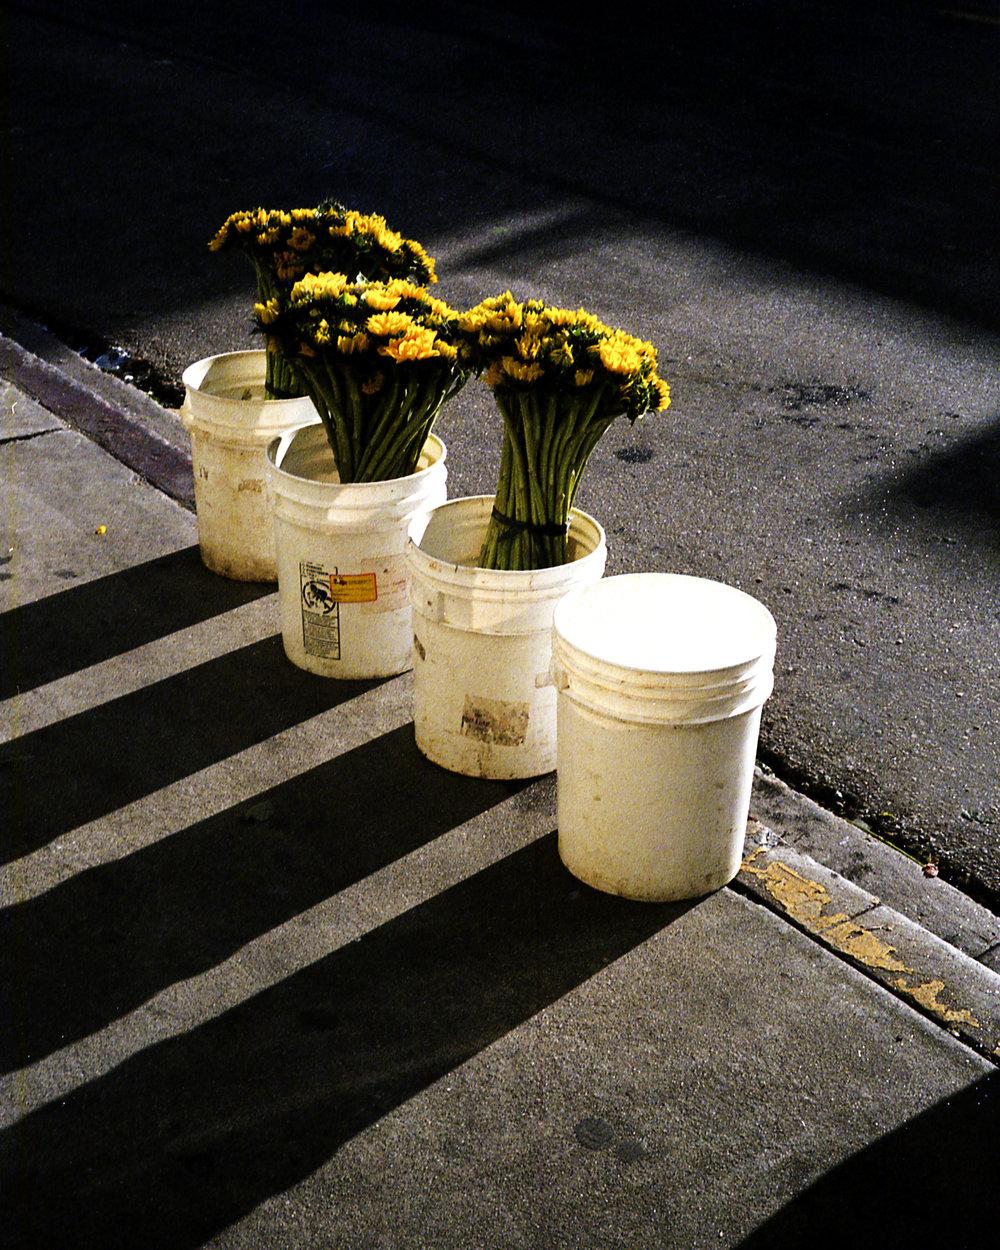 Los Angeles Flower District (2019)